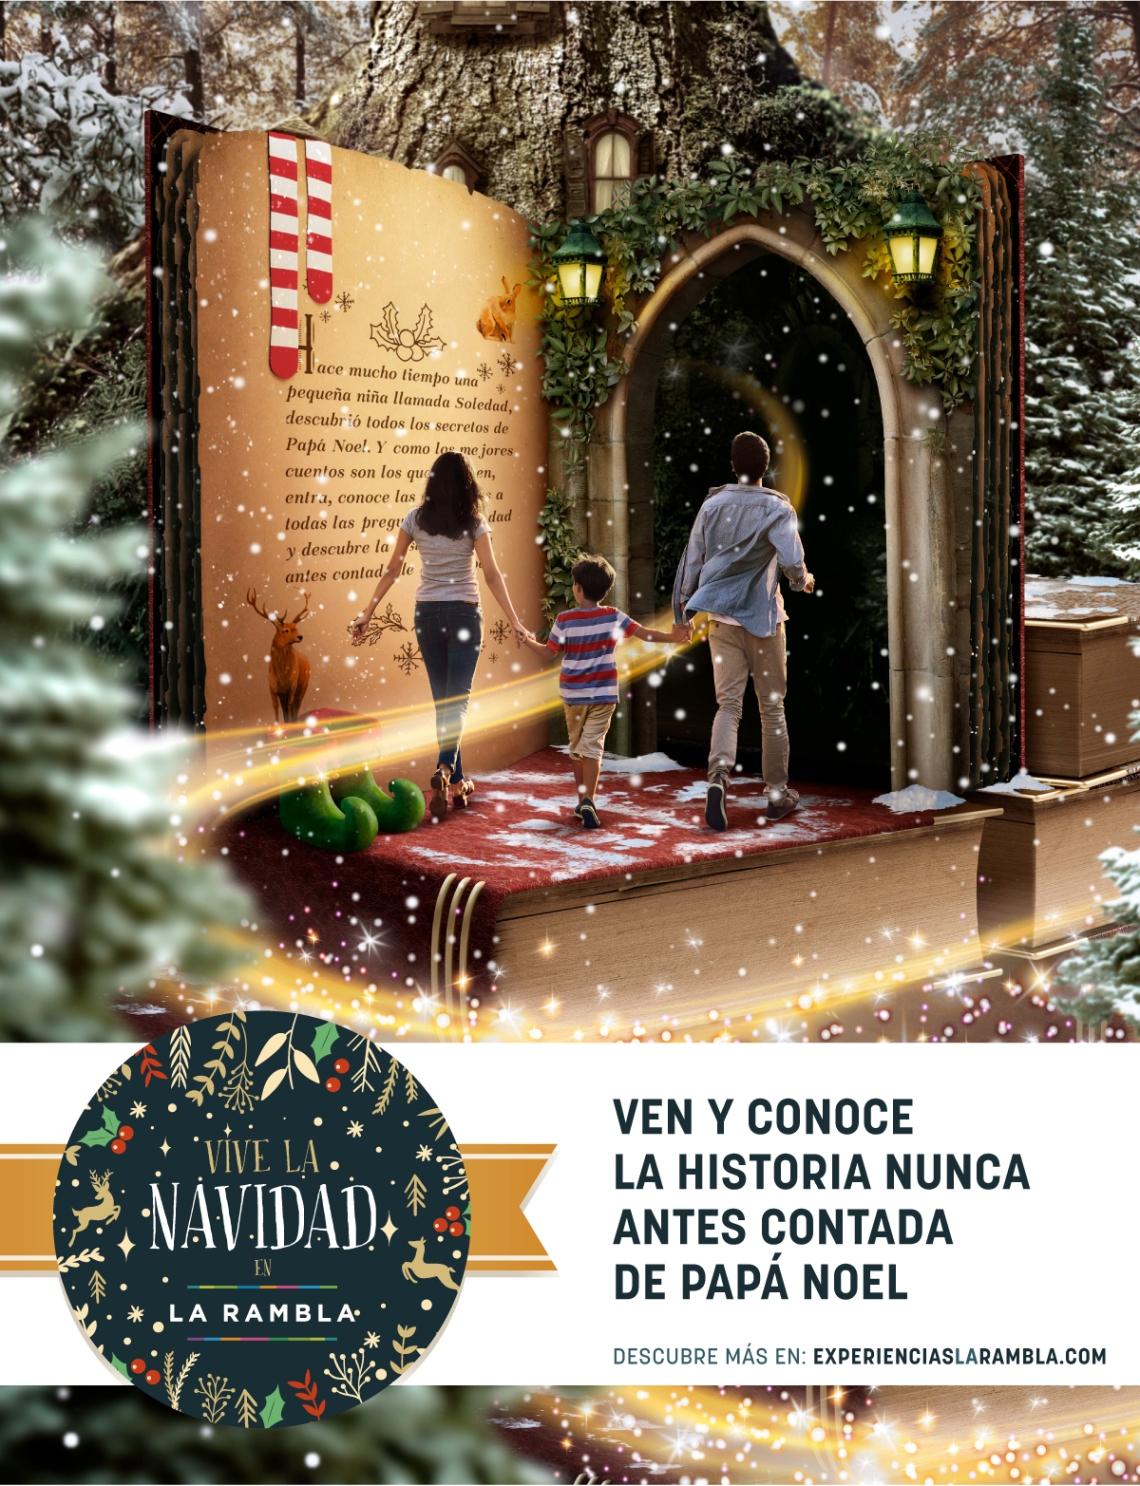 La Rambla Navidad.jpg